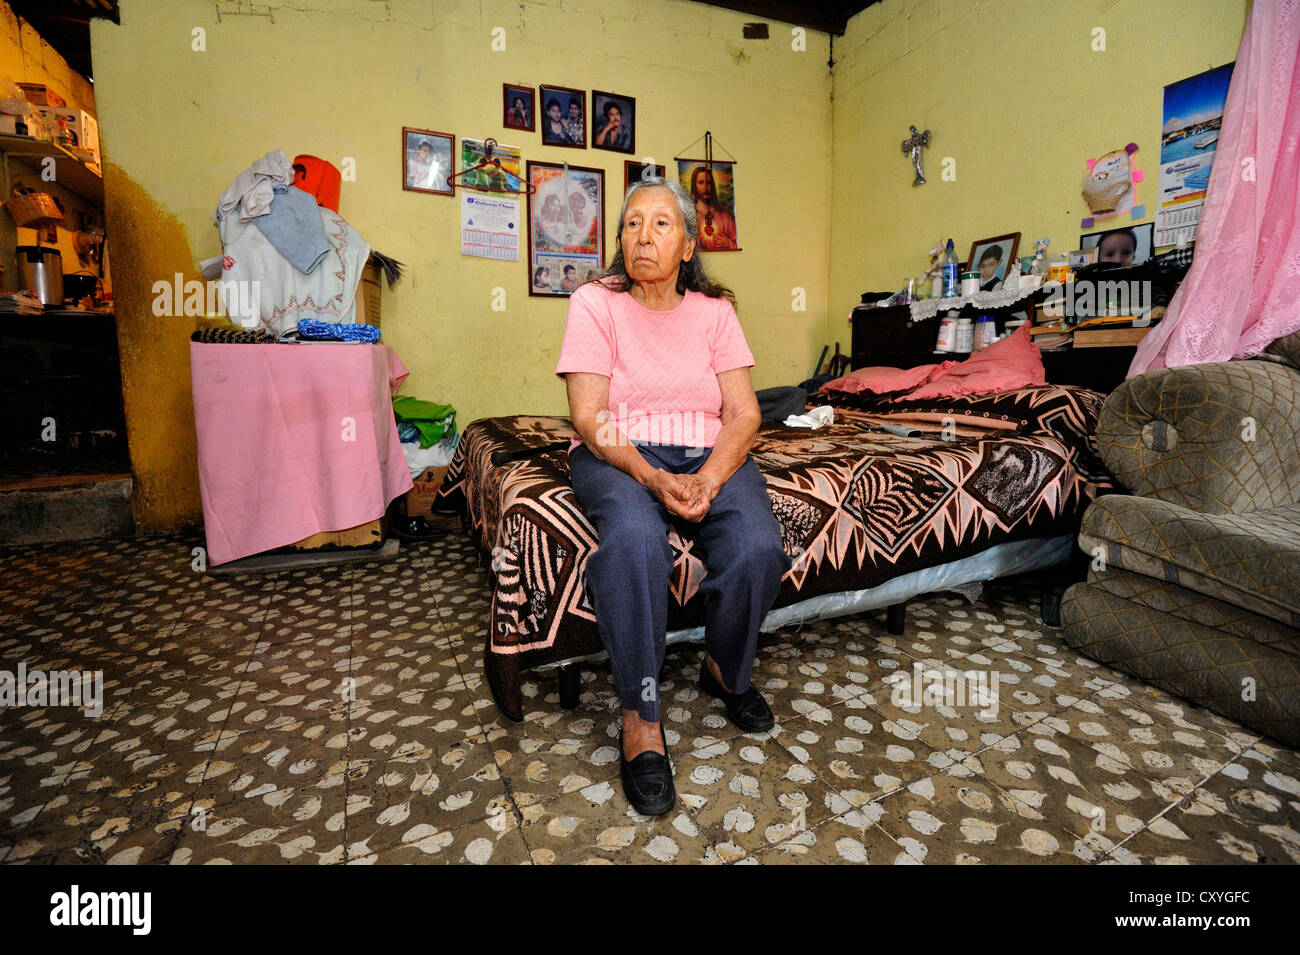 Old woman sitting in her humble apartment, El Esfuerzo slum, Guatemala City, Guatemala, Central America - Stock Image